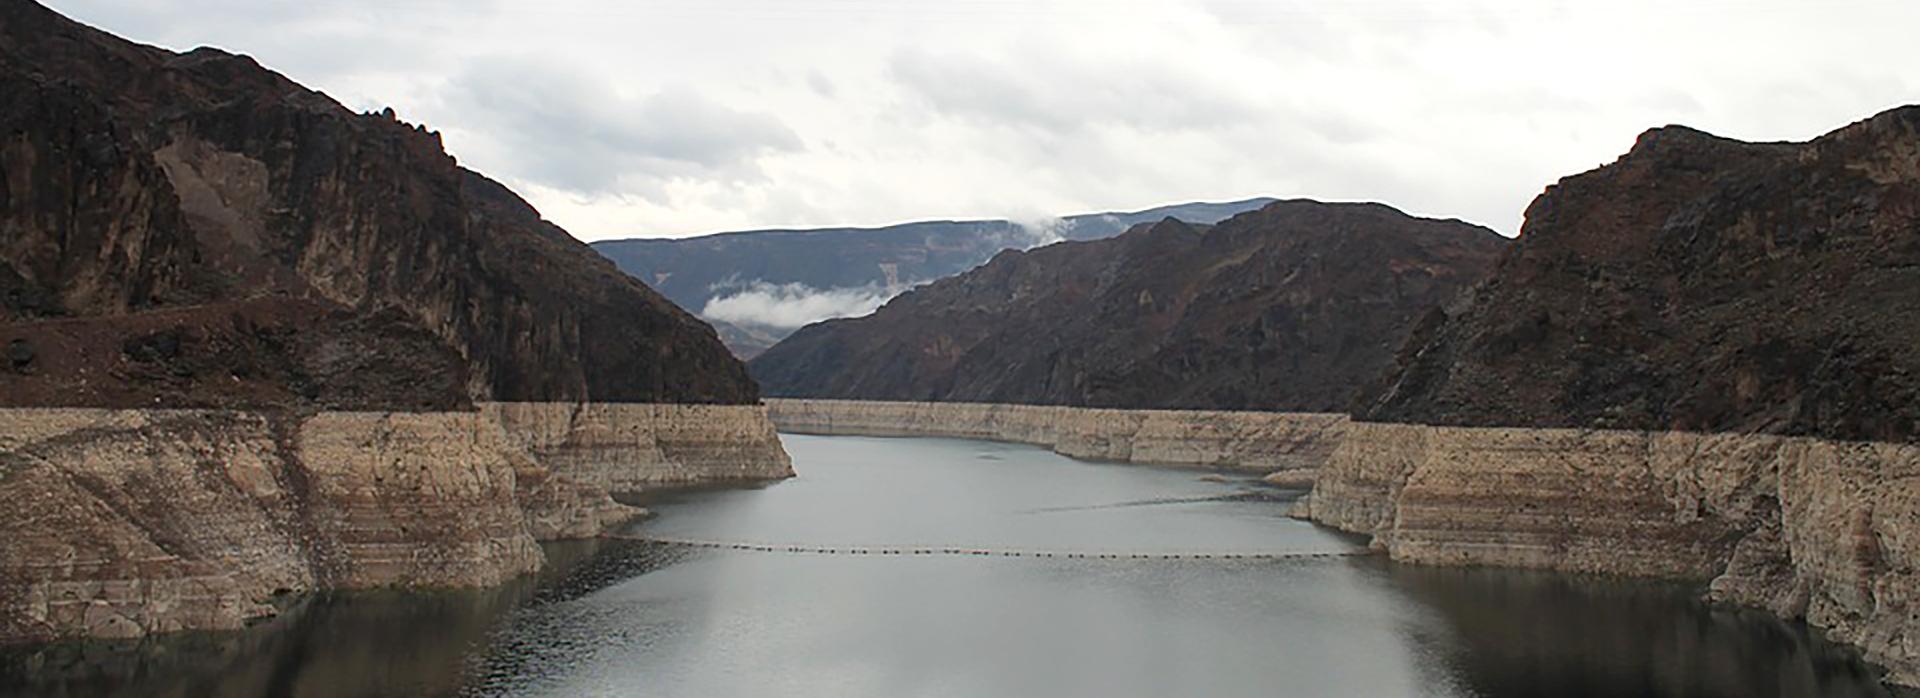 Lake mead cloudy